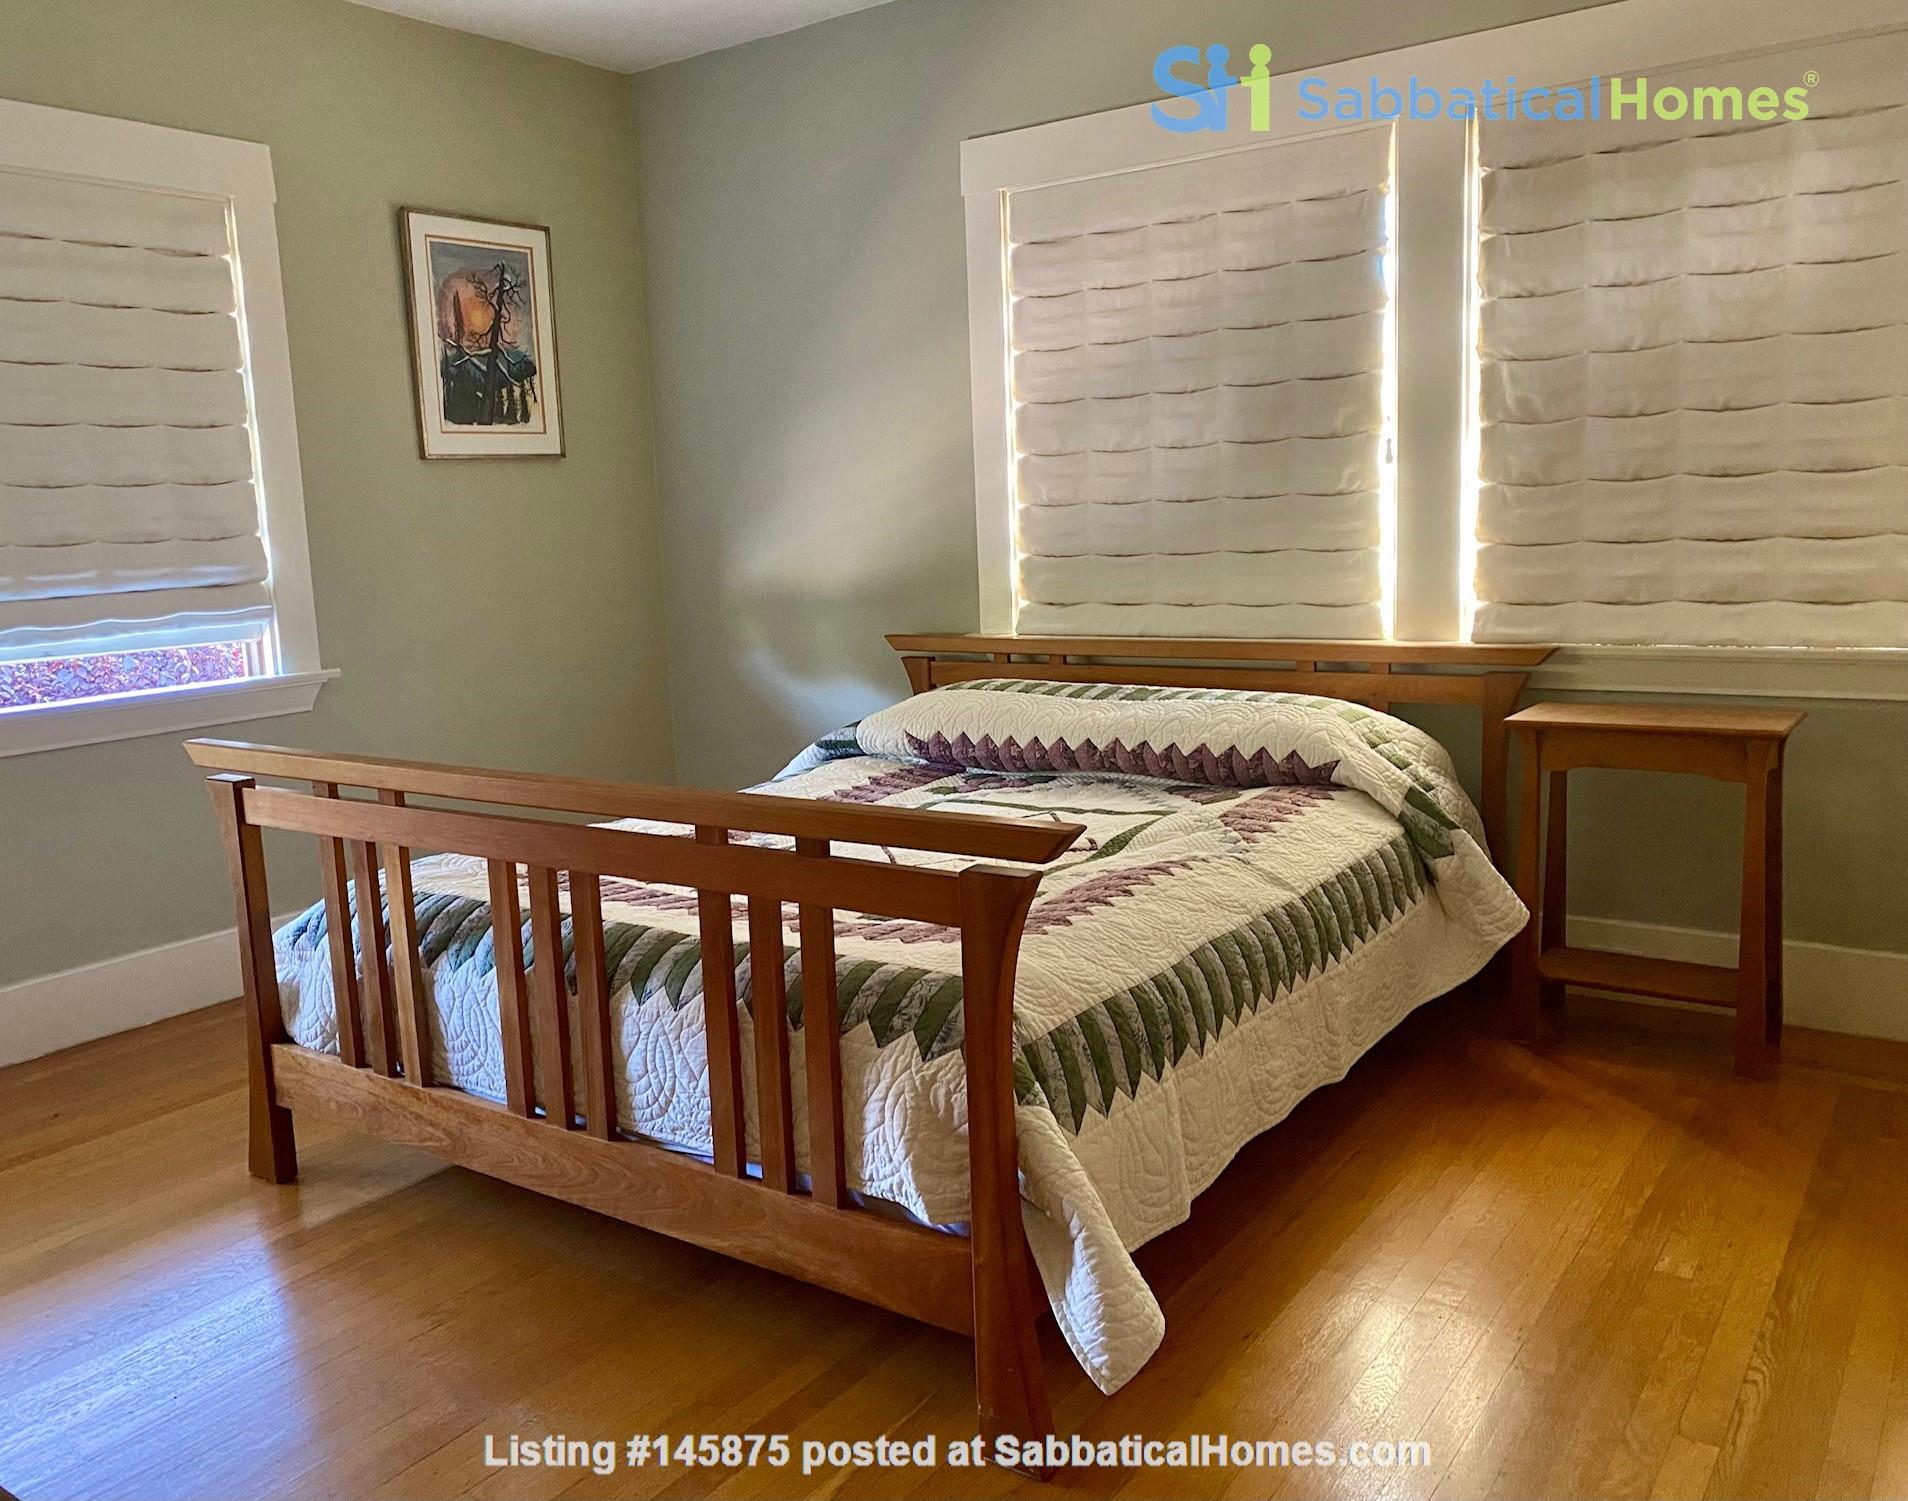 Beautiful 4 Bedroom Craftsman Home in Highly Rated Piedmont School District Home Rental in Piedmont 4